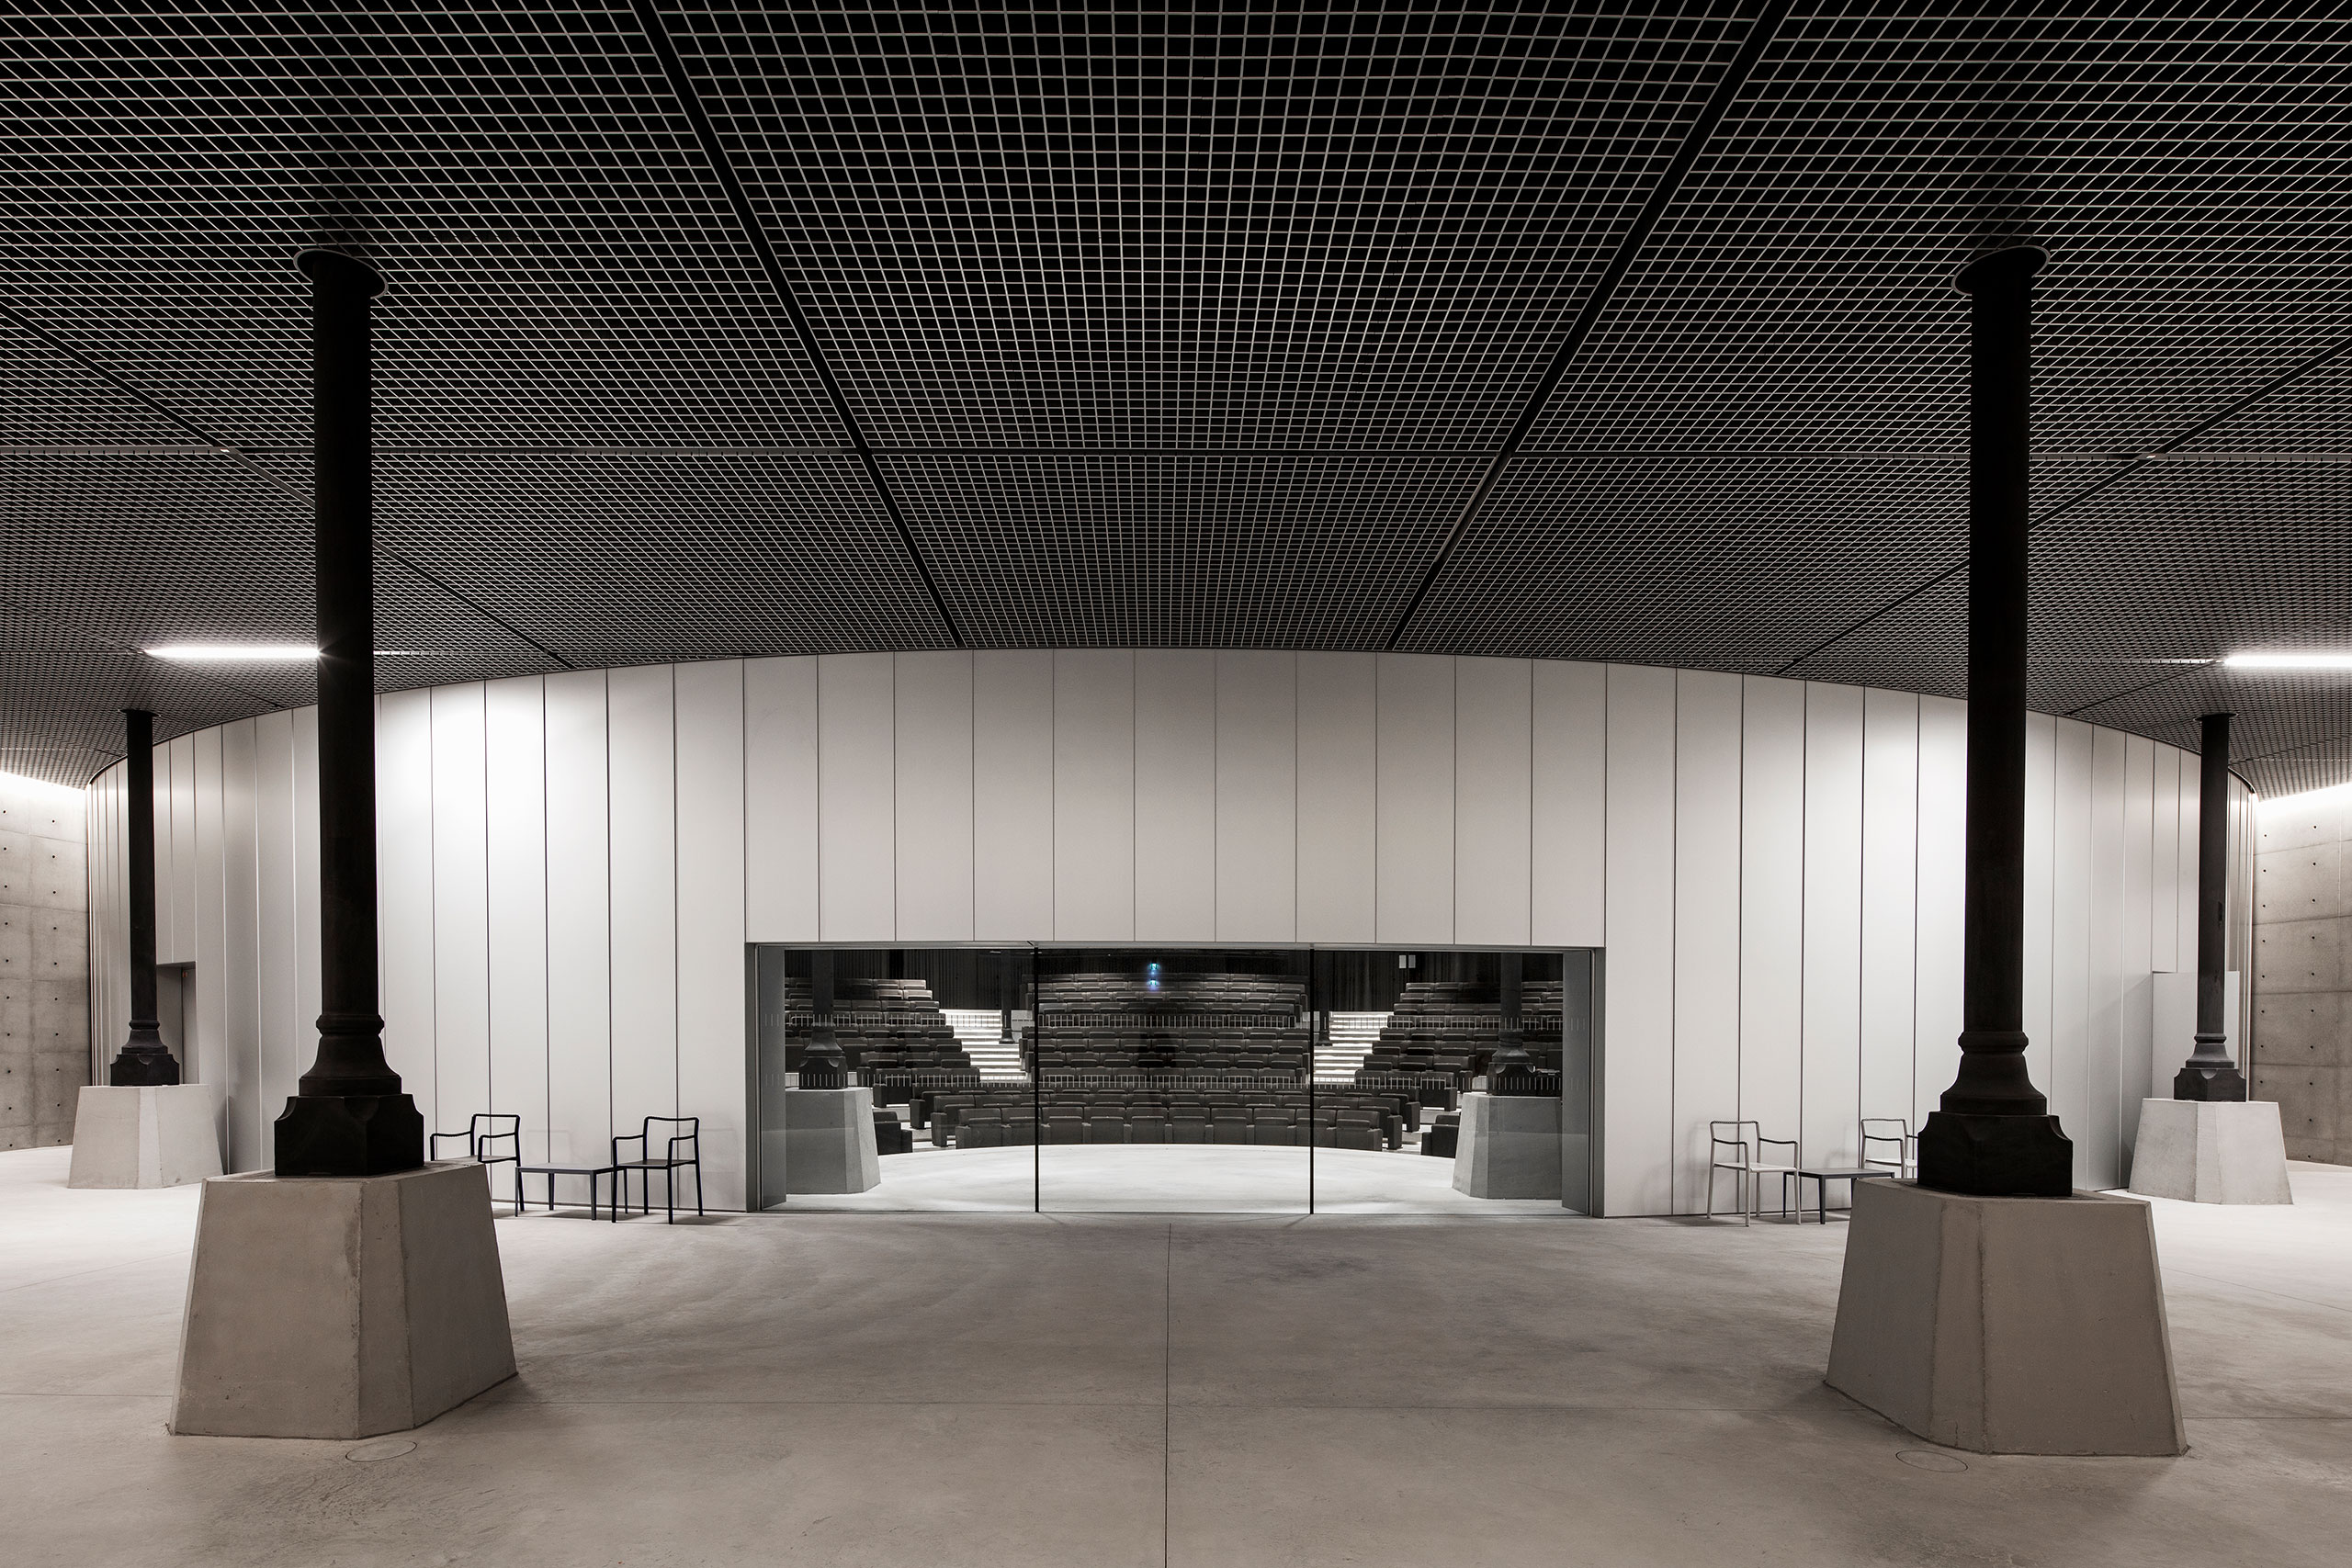 Bourse de Commerce - Pinault Collection © Tadao Ando Architect & Associates, Niney et Marca Architectes. Photo Patrick Tourneboeuf